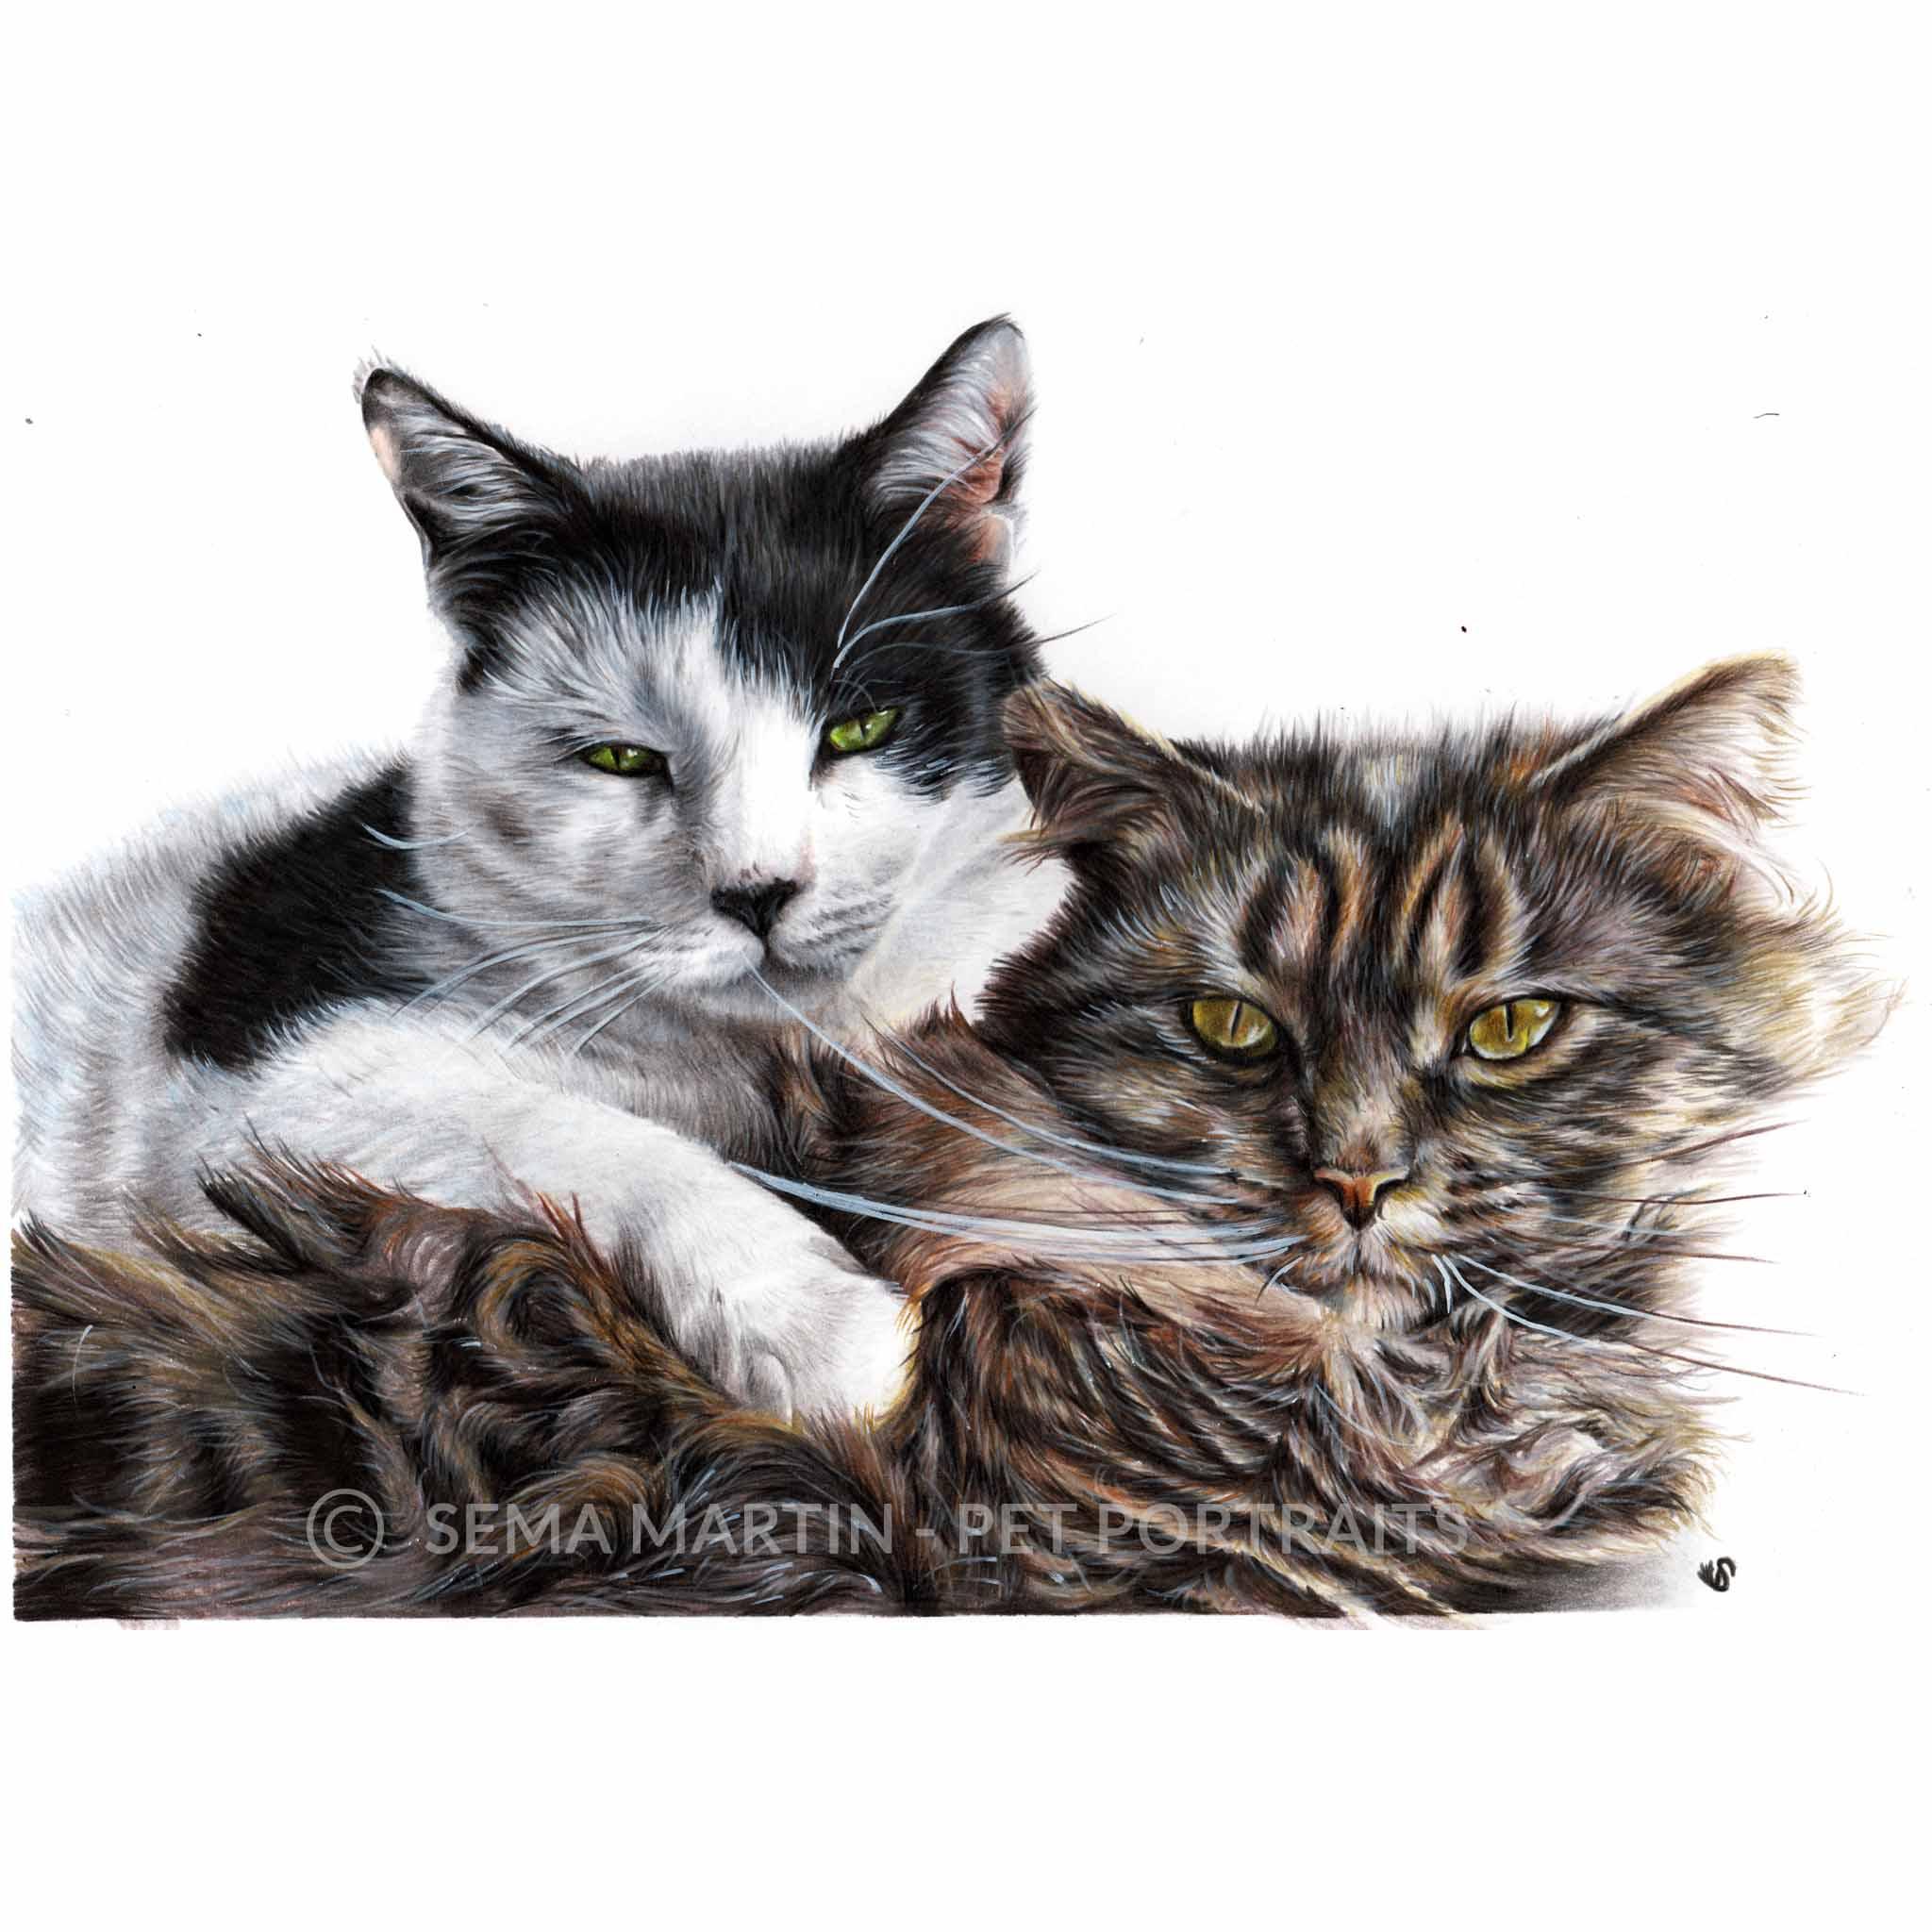 'Phantom & Gabrielle' - USA, 8.3 x 11.7 inches, 2018, Colored Pencil Cat Portrait